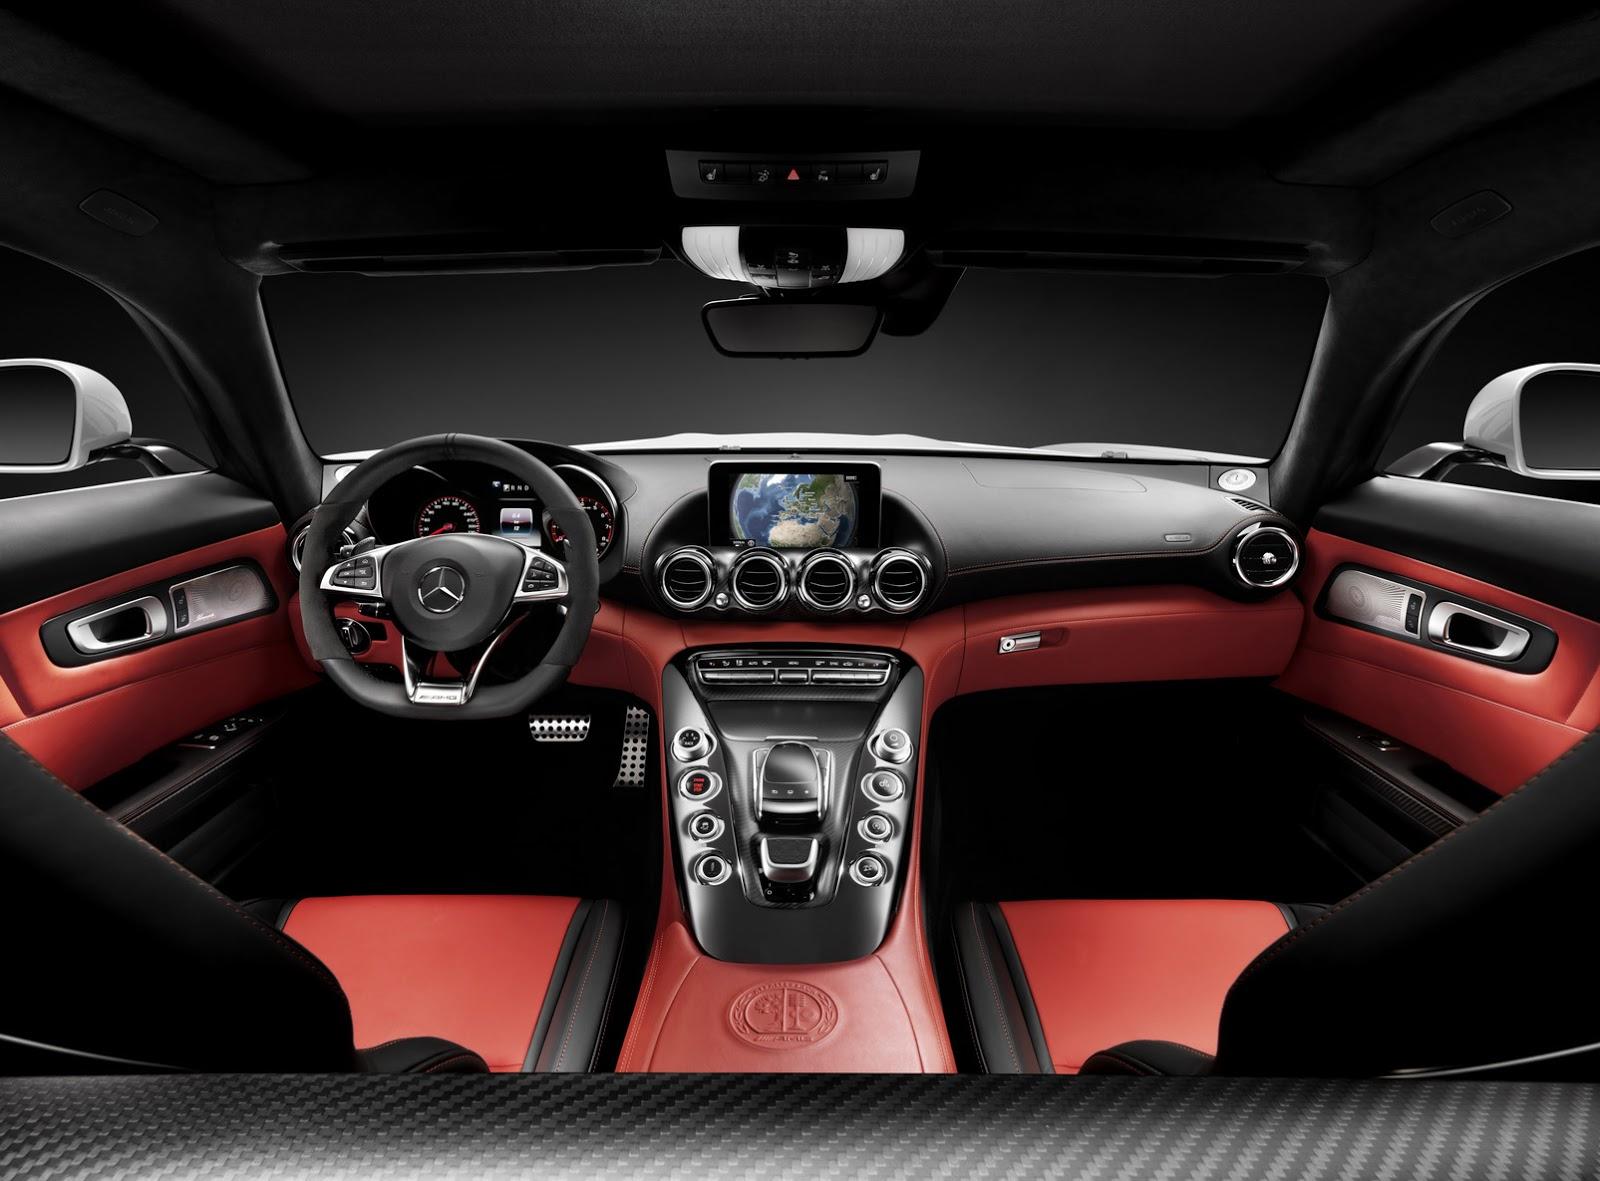 Interior mercedes amg gt s dtm safety car c190 2015 pr - An Error Occurred